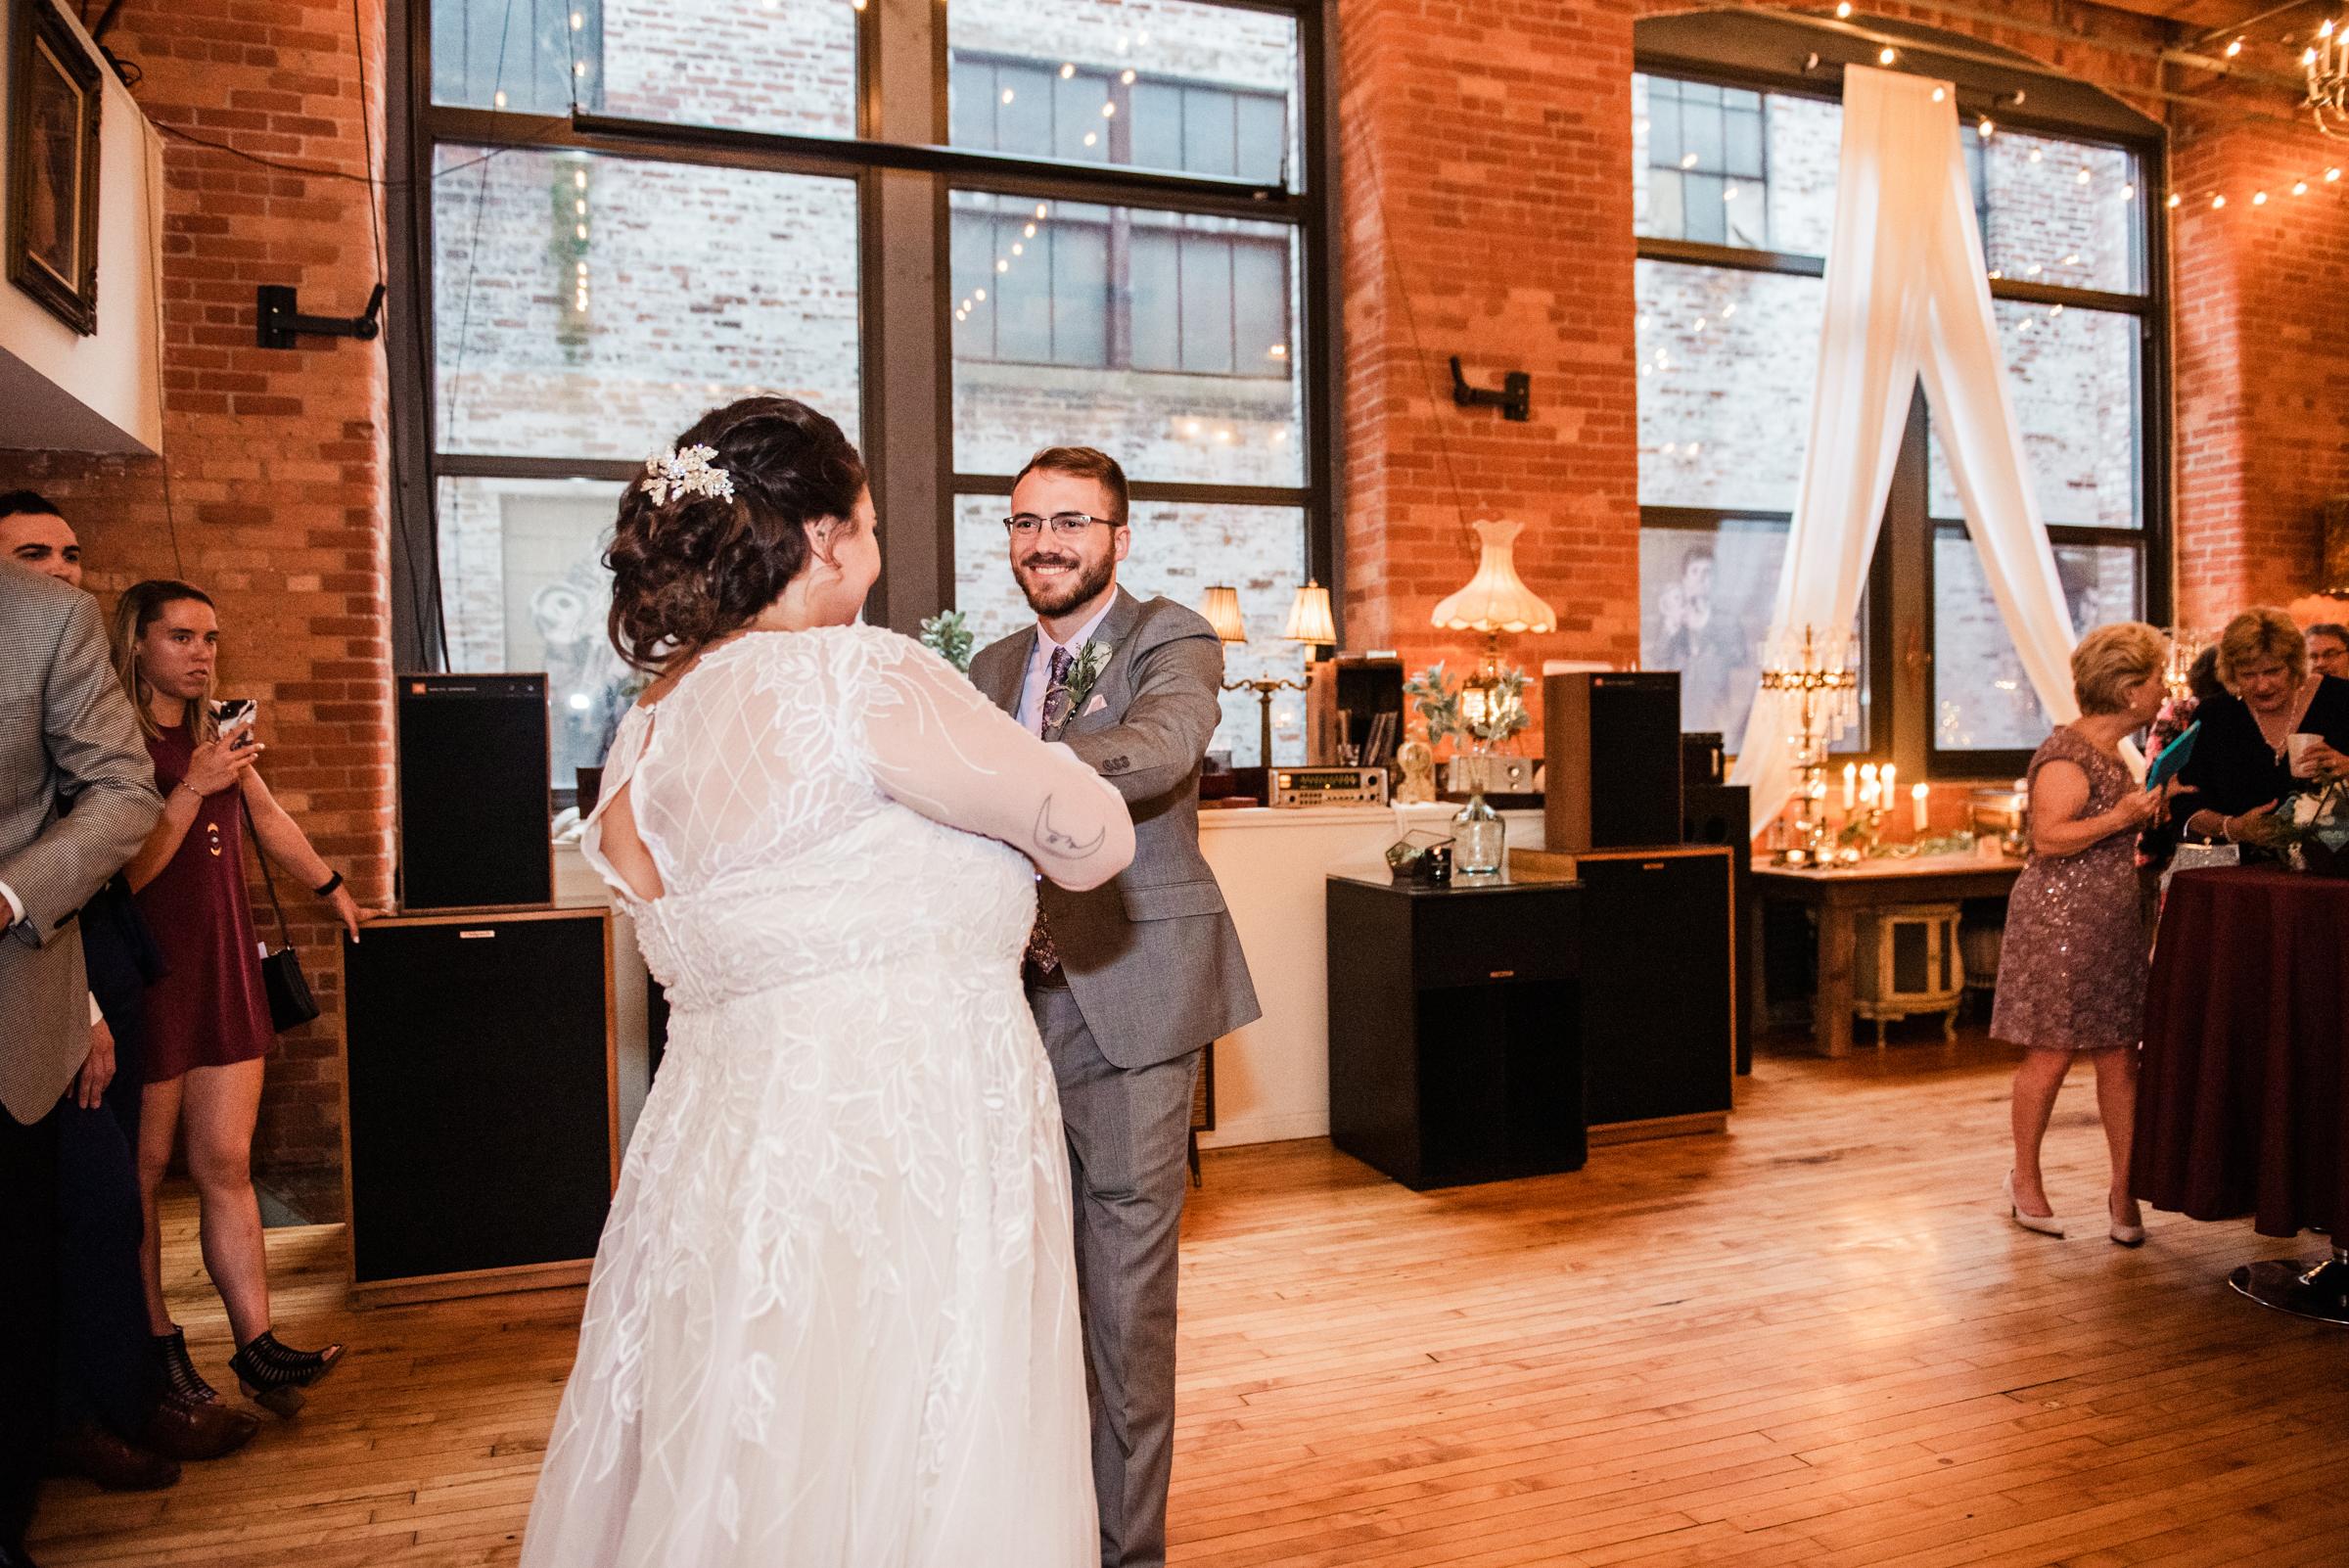 Studio_180_Lamberton_Conservatory_Rochester_Wedding_JILL_STUDIO_Rochester_NY_Photographer_DSC_9143.jpg